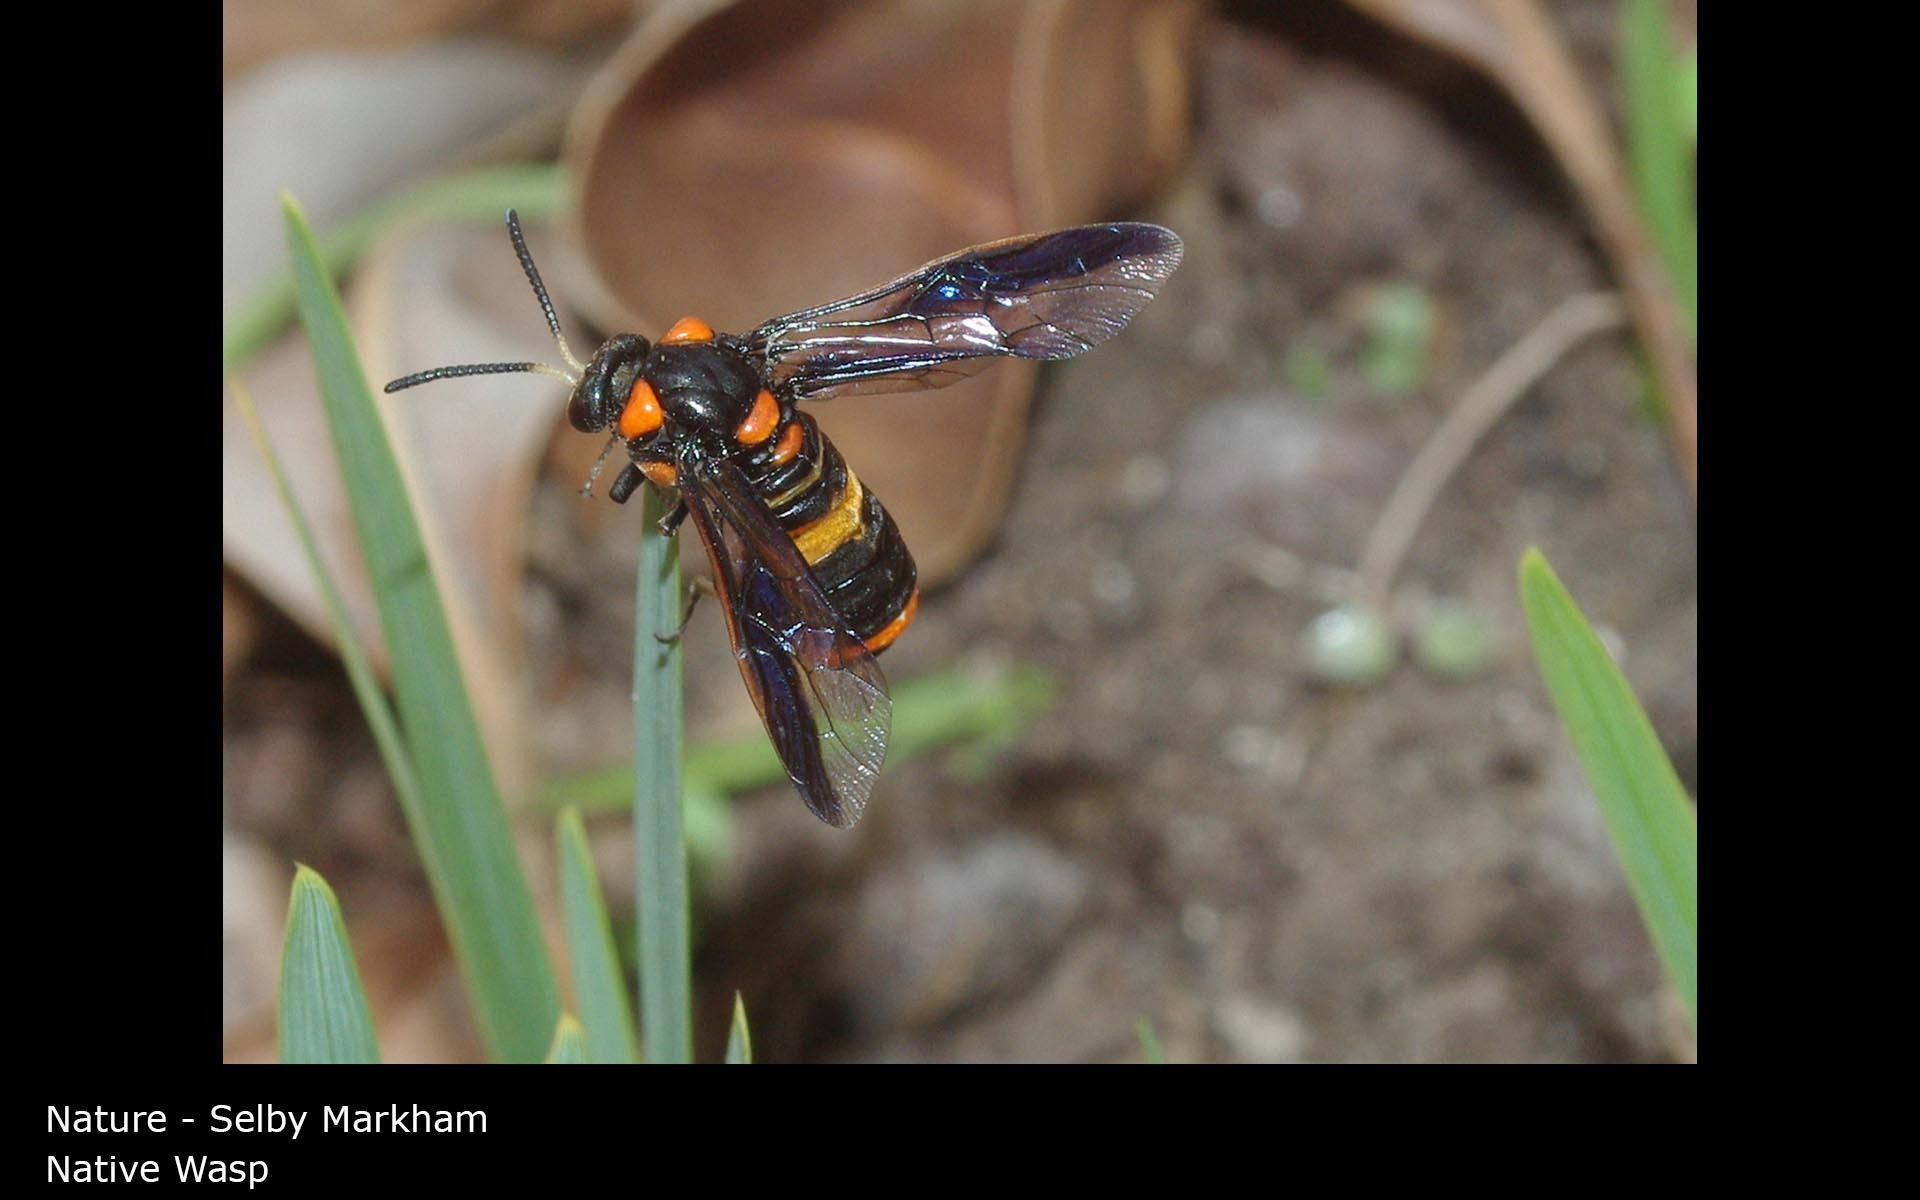 Native Wasp - Selby Markham